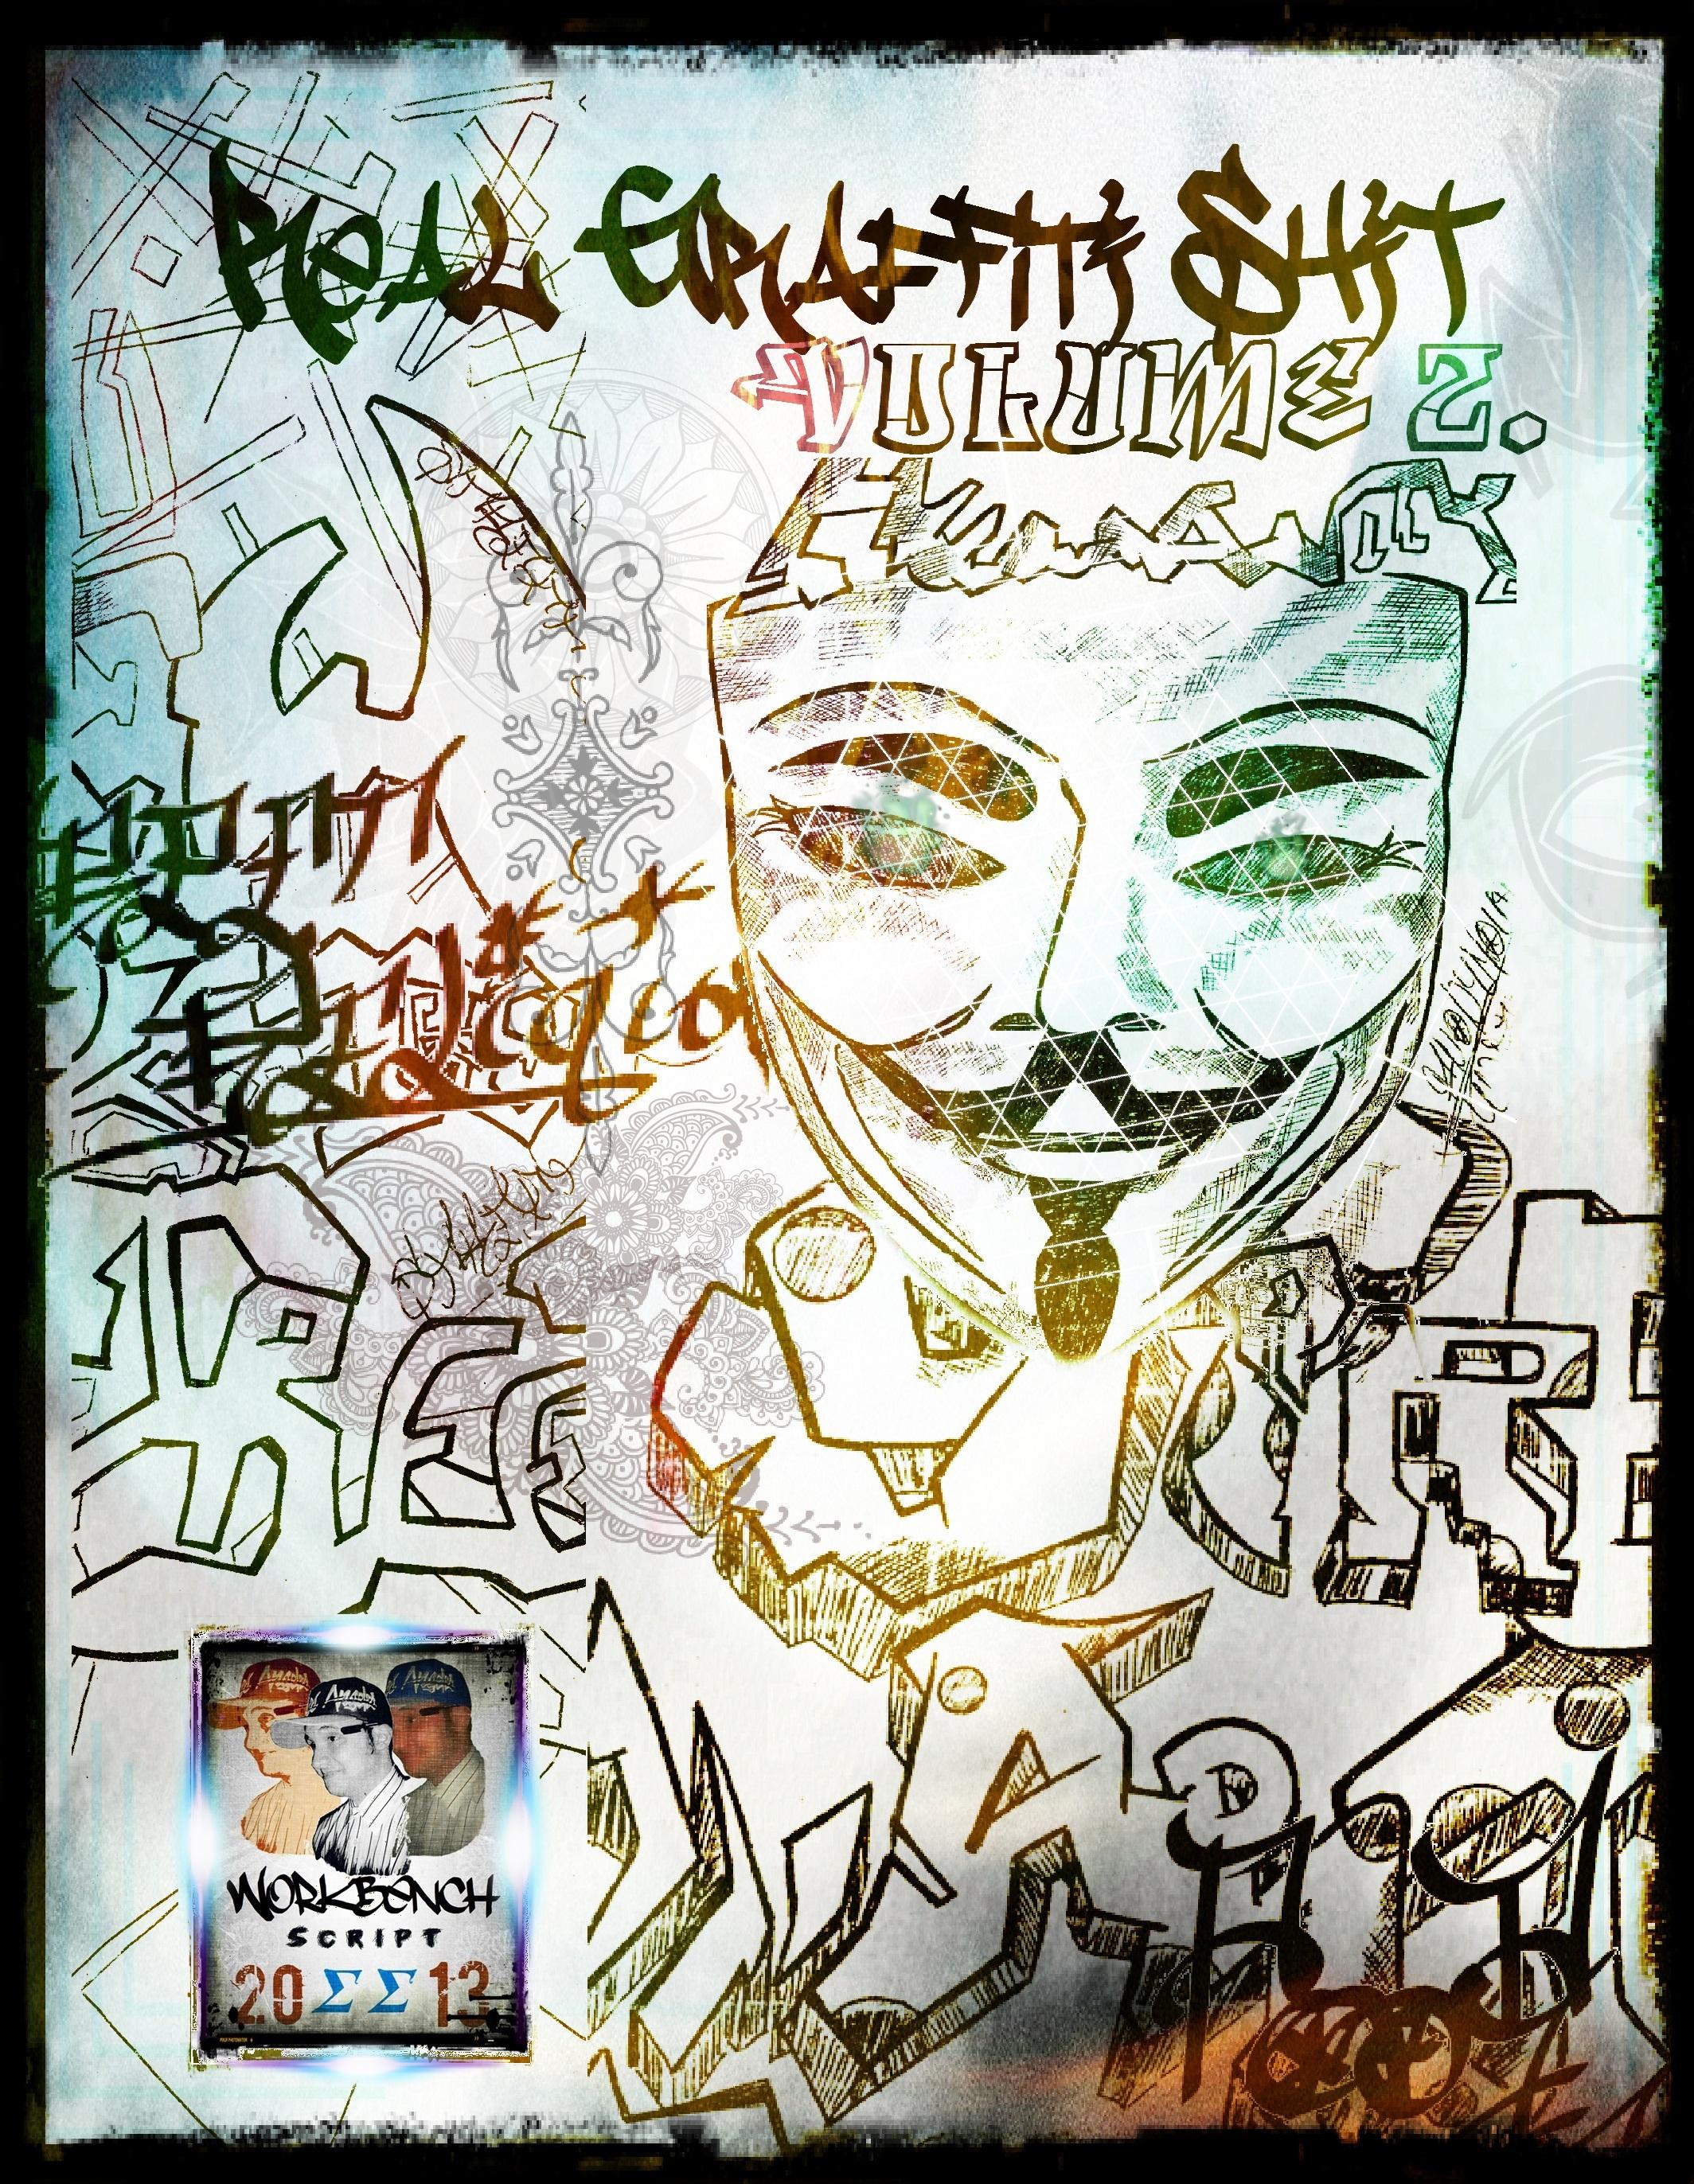 Real Graffiti Shit Volume 2 by Workbench Script SS